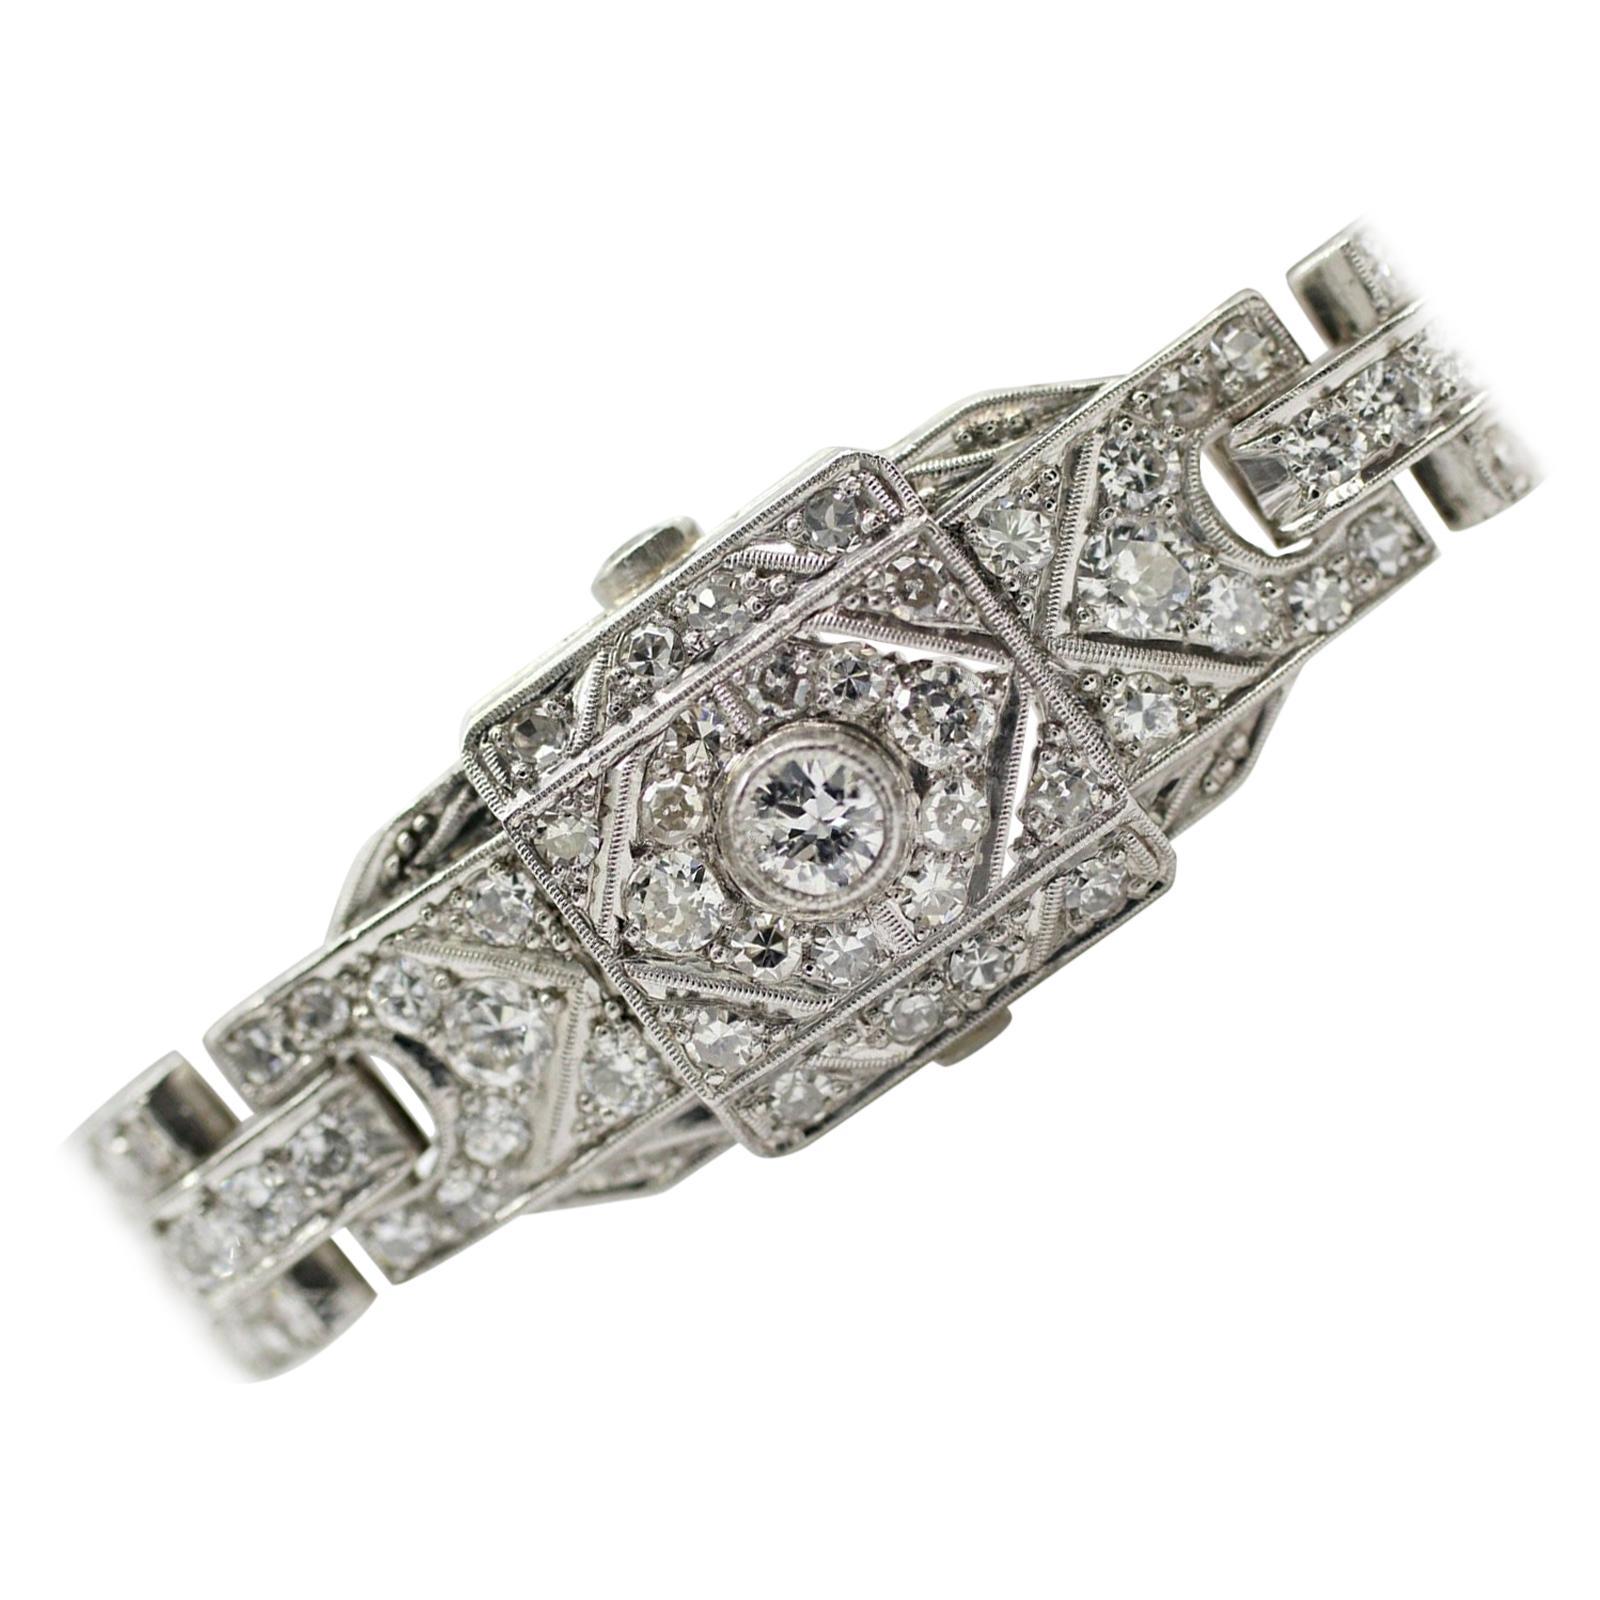 Iridium/Platinum Art Deco Style Diamond Watch Bracelet